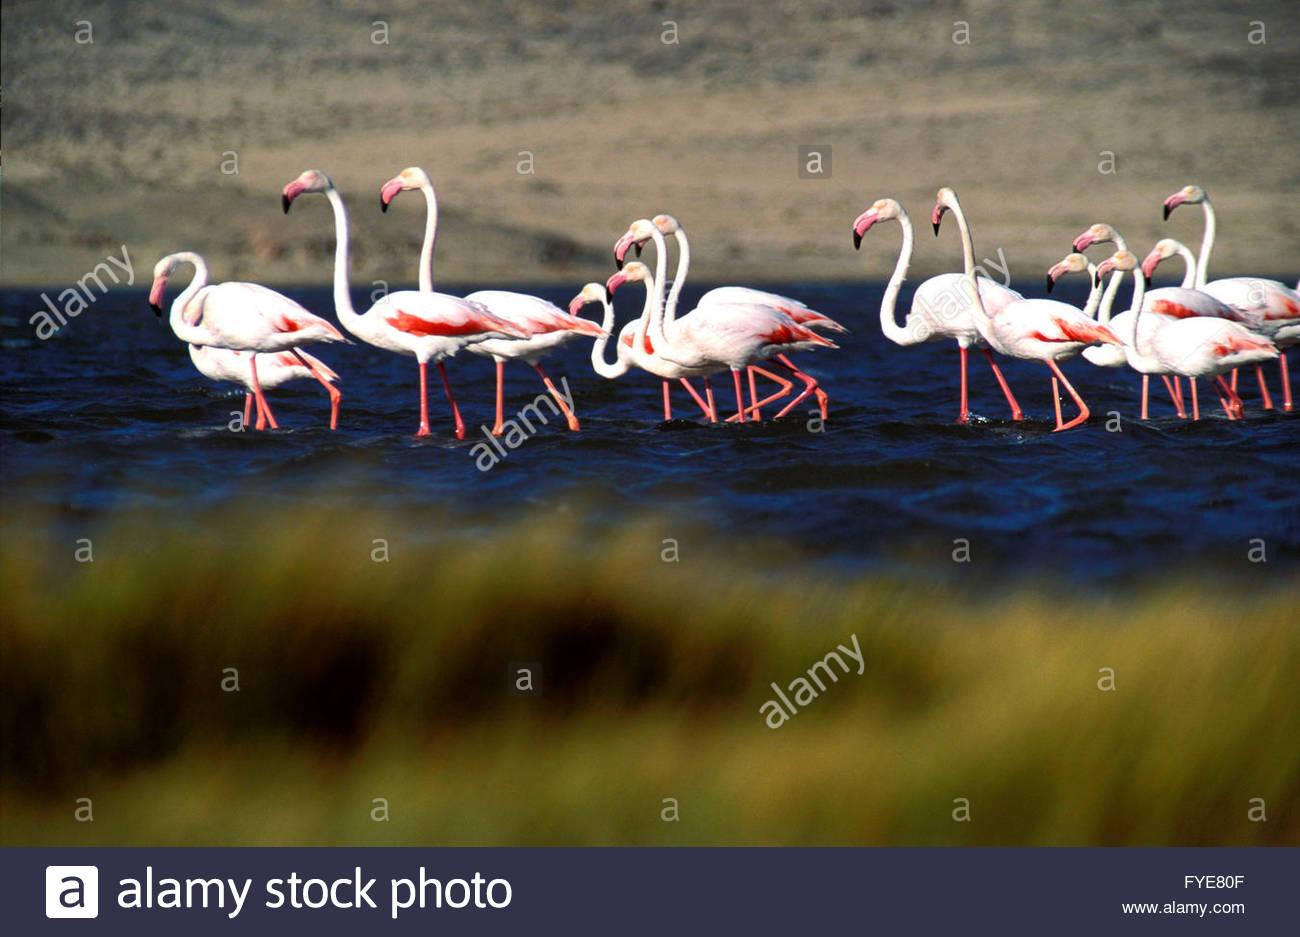 Flamingoes in the Namib desert Namibia. - Stock Image